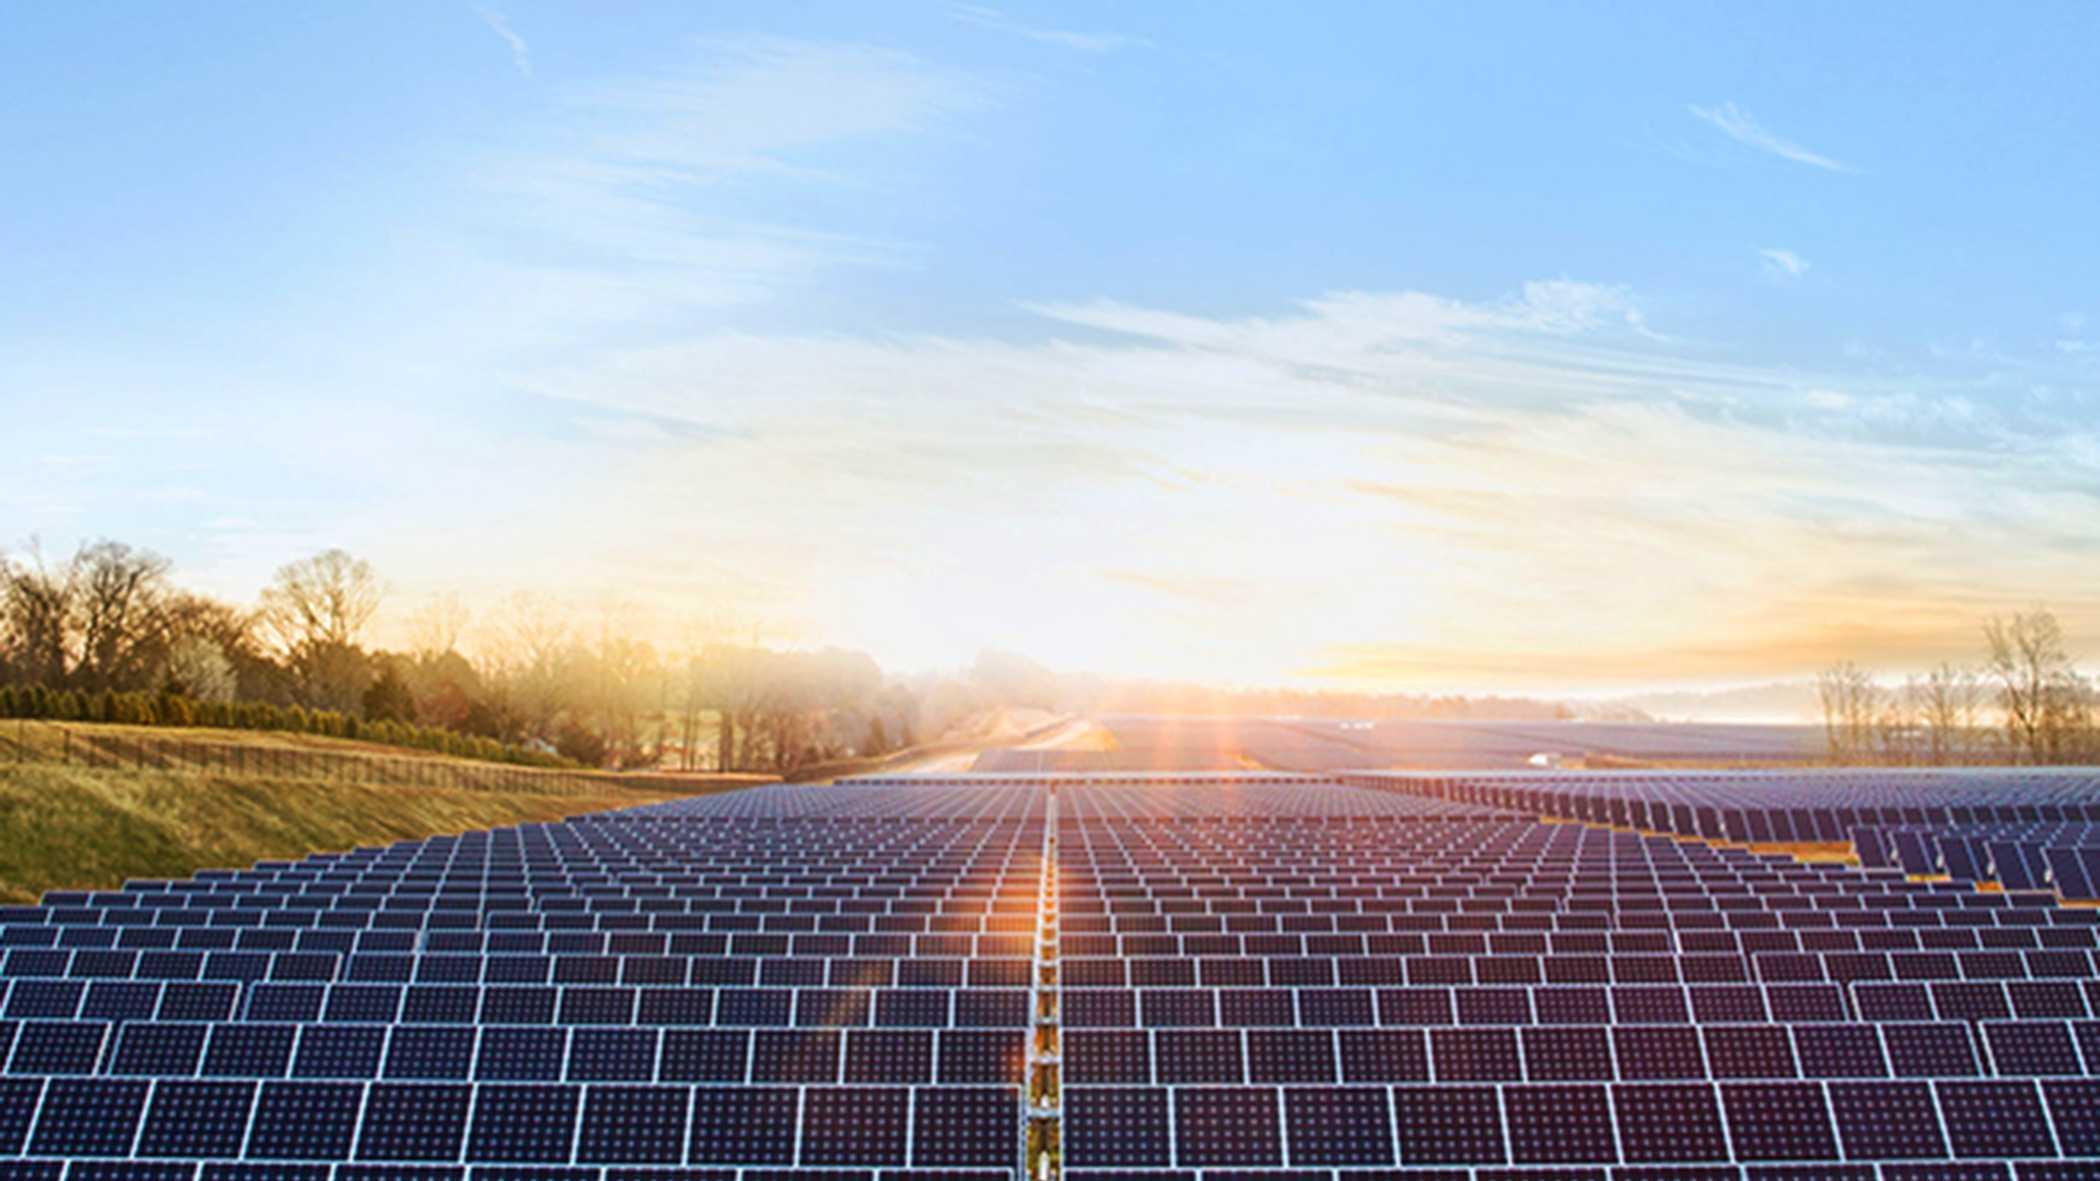 Apple's Maiden, N.C. solar farm